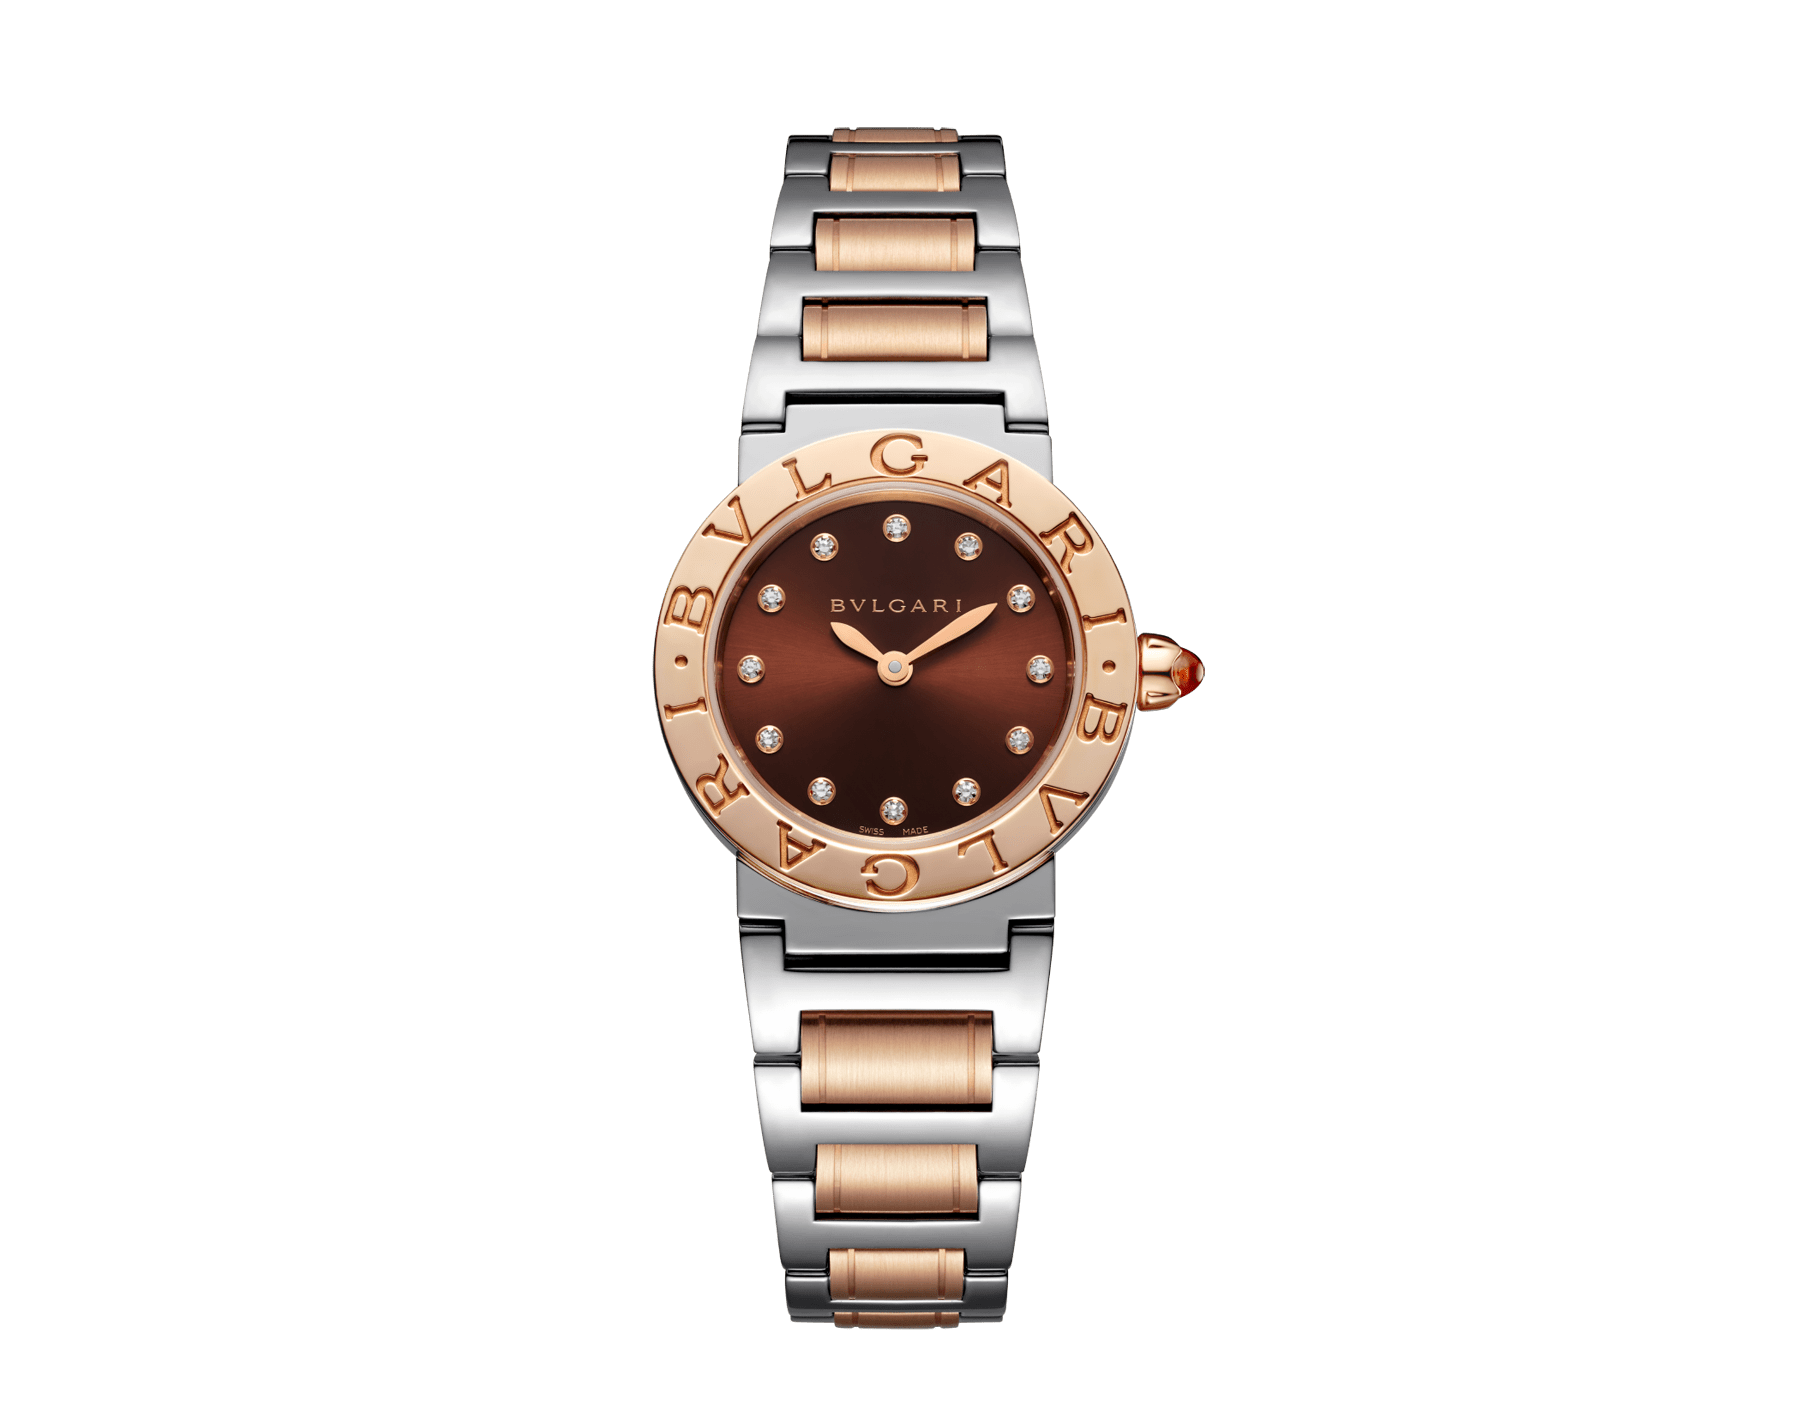 BVLGARI BVLGARI 腕錶,精鋼和 18K 玫瑰金錶殼和錶帶,棕色太陽紋漆面錶盤,鑽石時標。S 尺寸。 102155 image 1